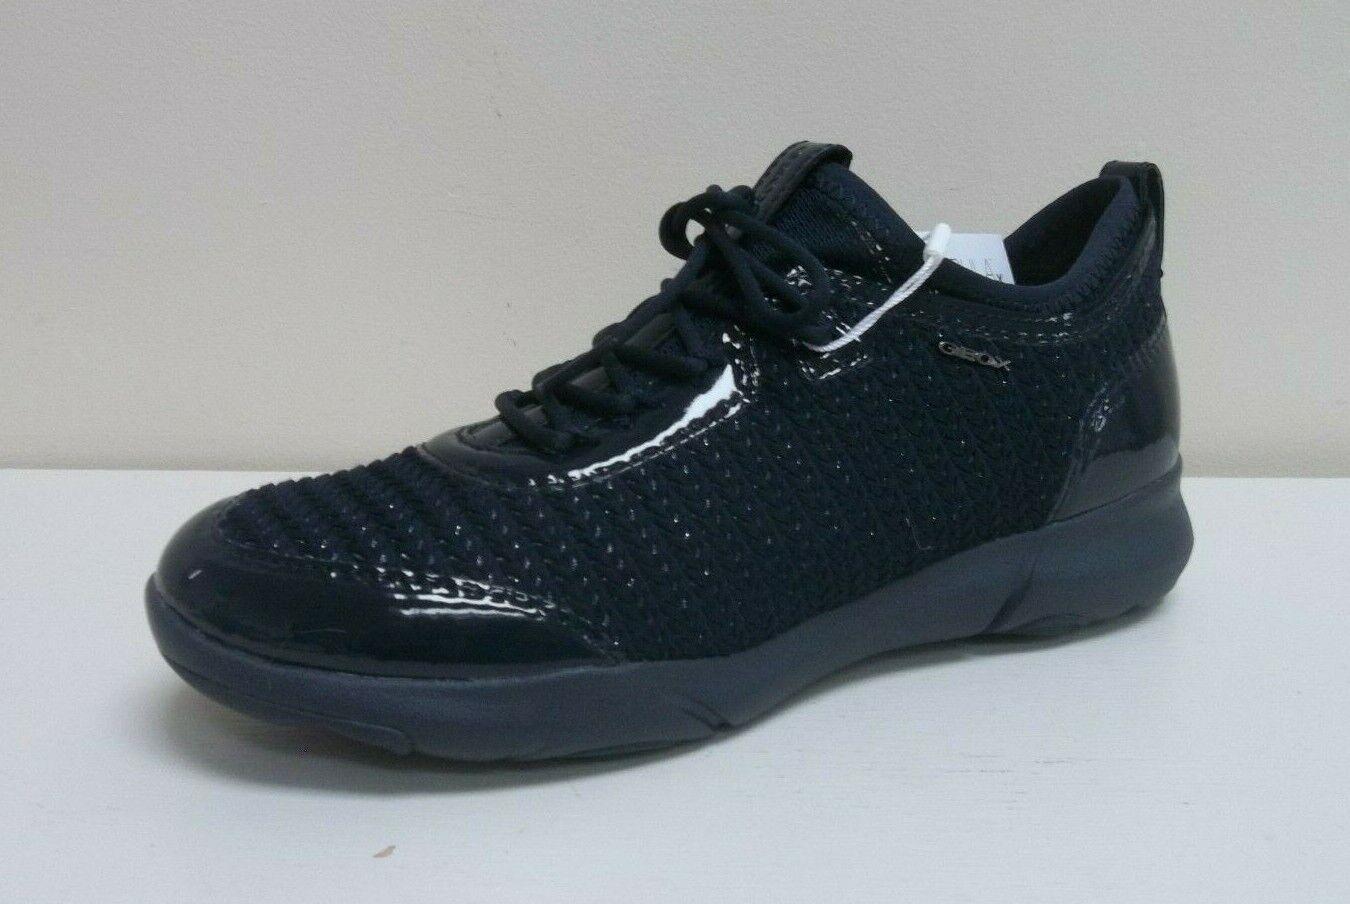 Geox Nebula Azul Marino Textil Zapatillas patente,  RRP  BNWB